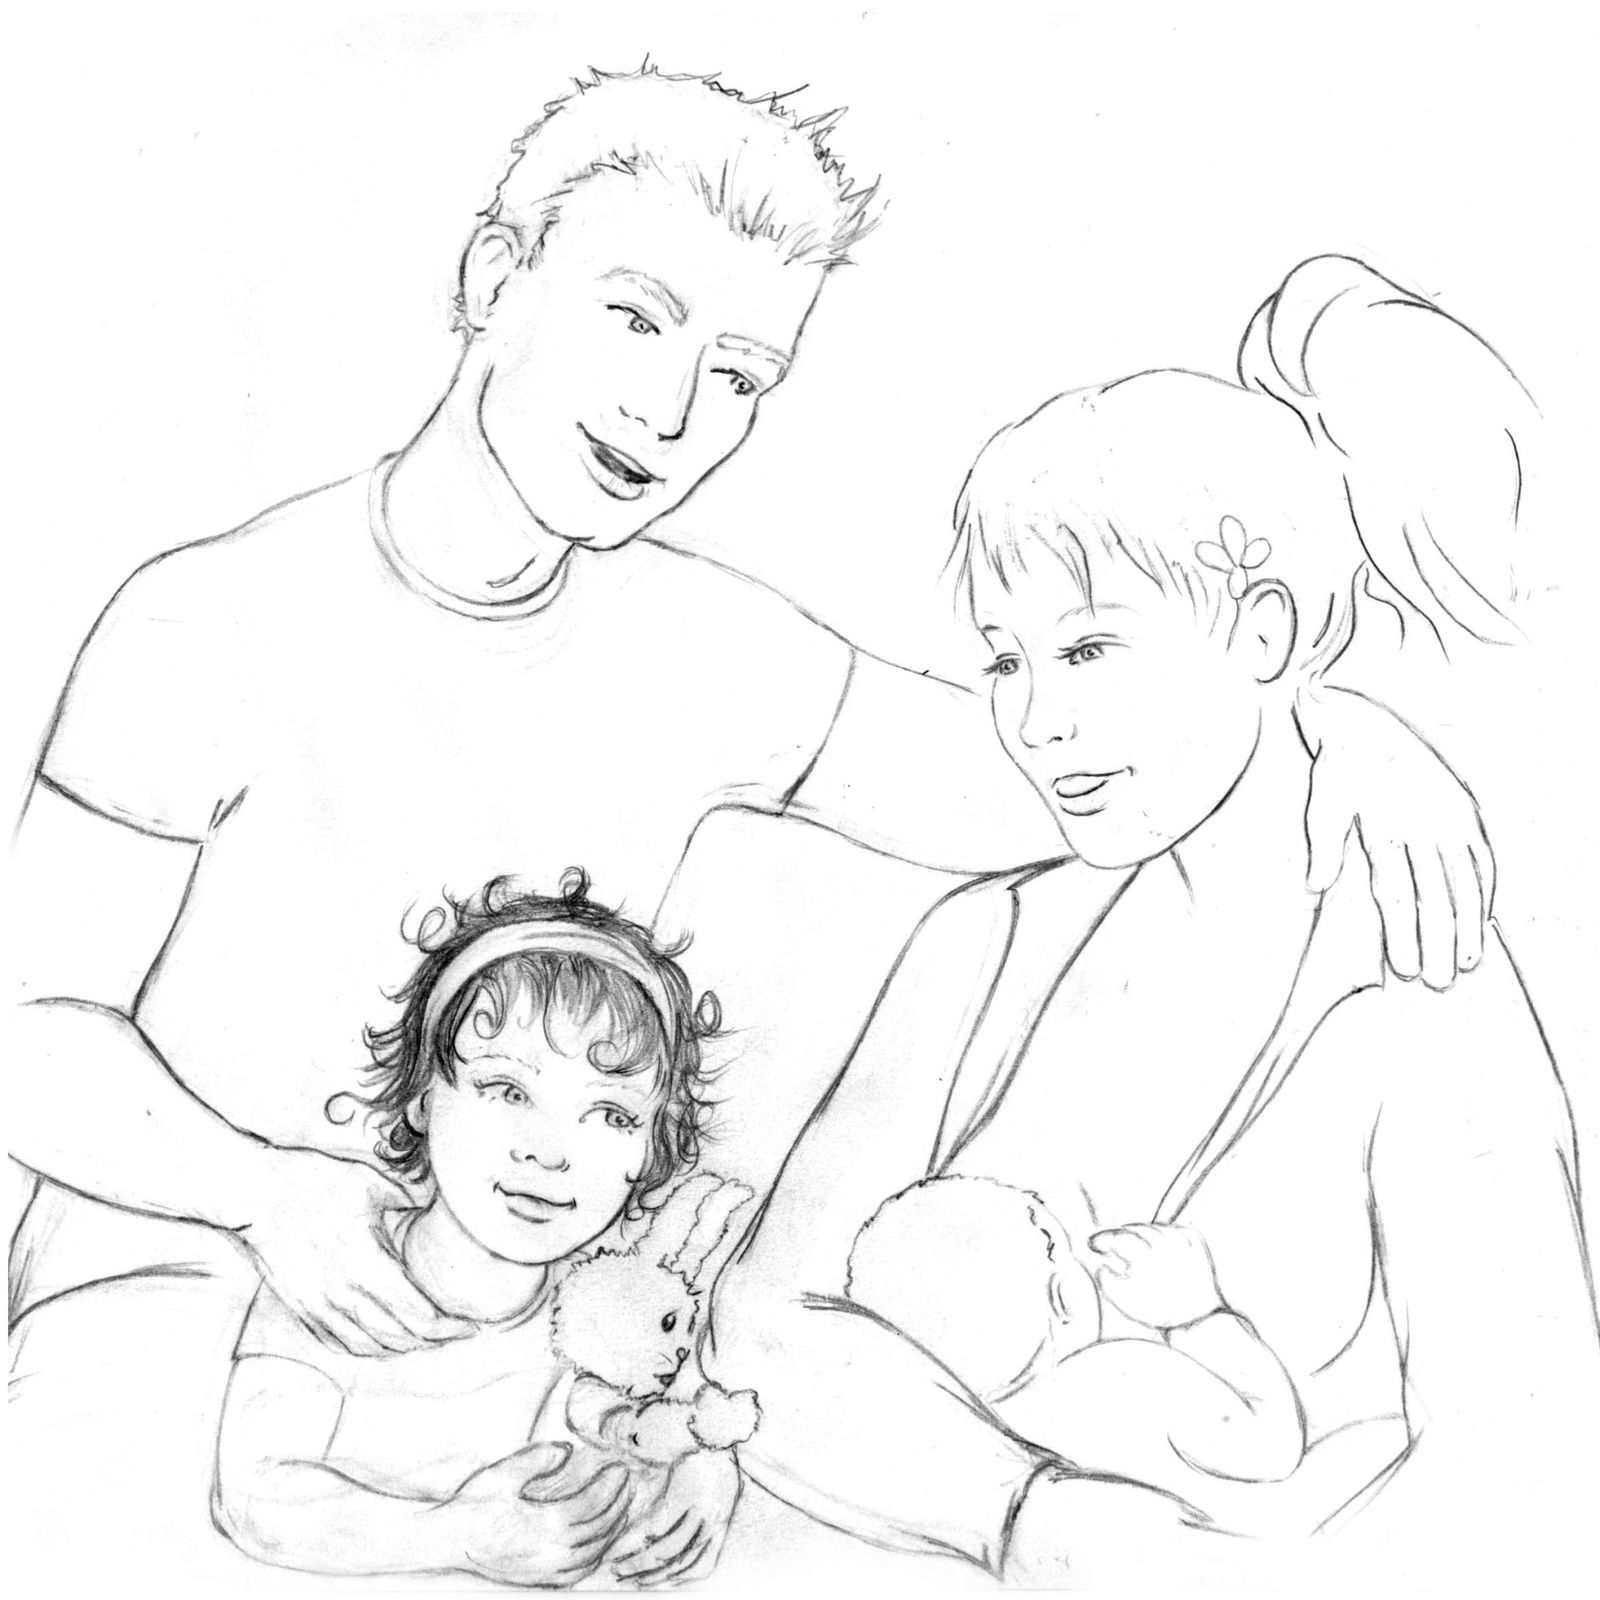 dessin allaitement florence megardon